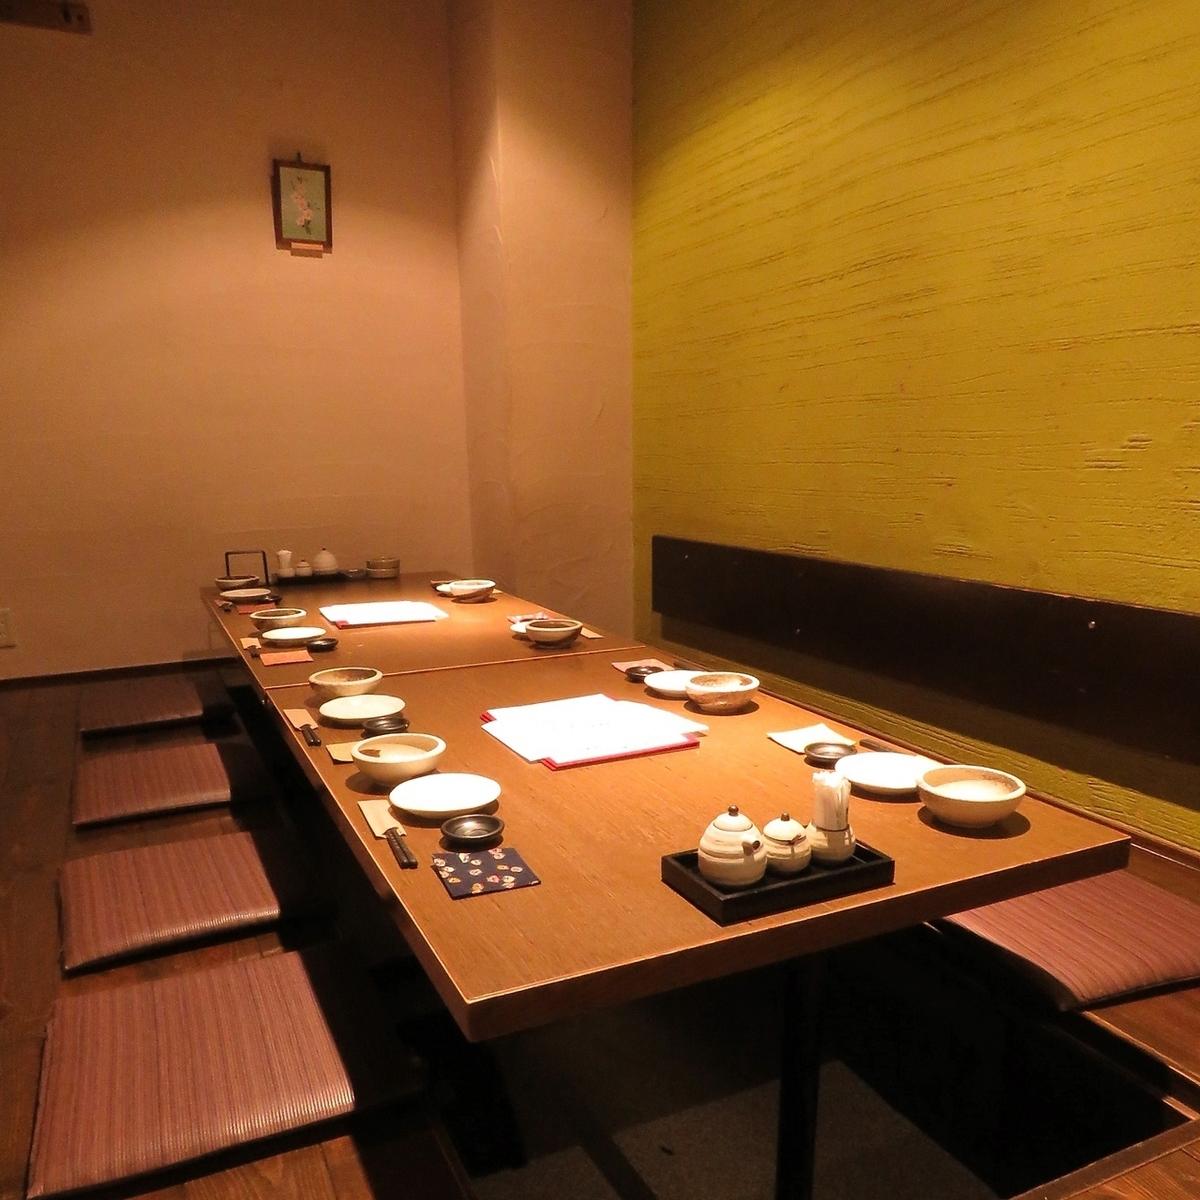 Half single room with roll curtains! Hanasaka or Taya Sanbancho